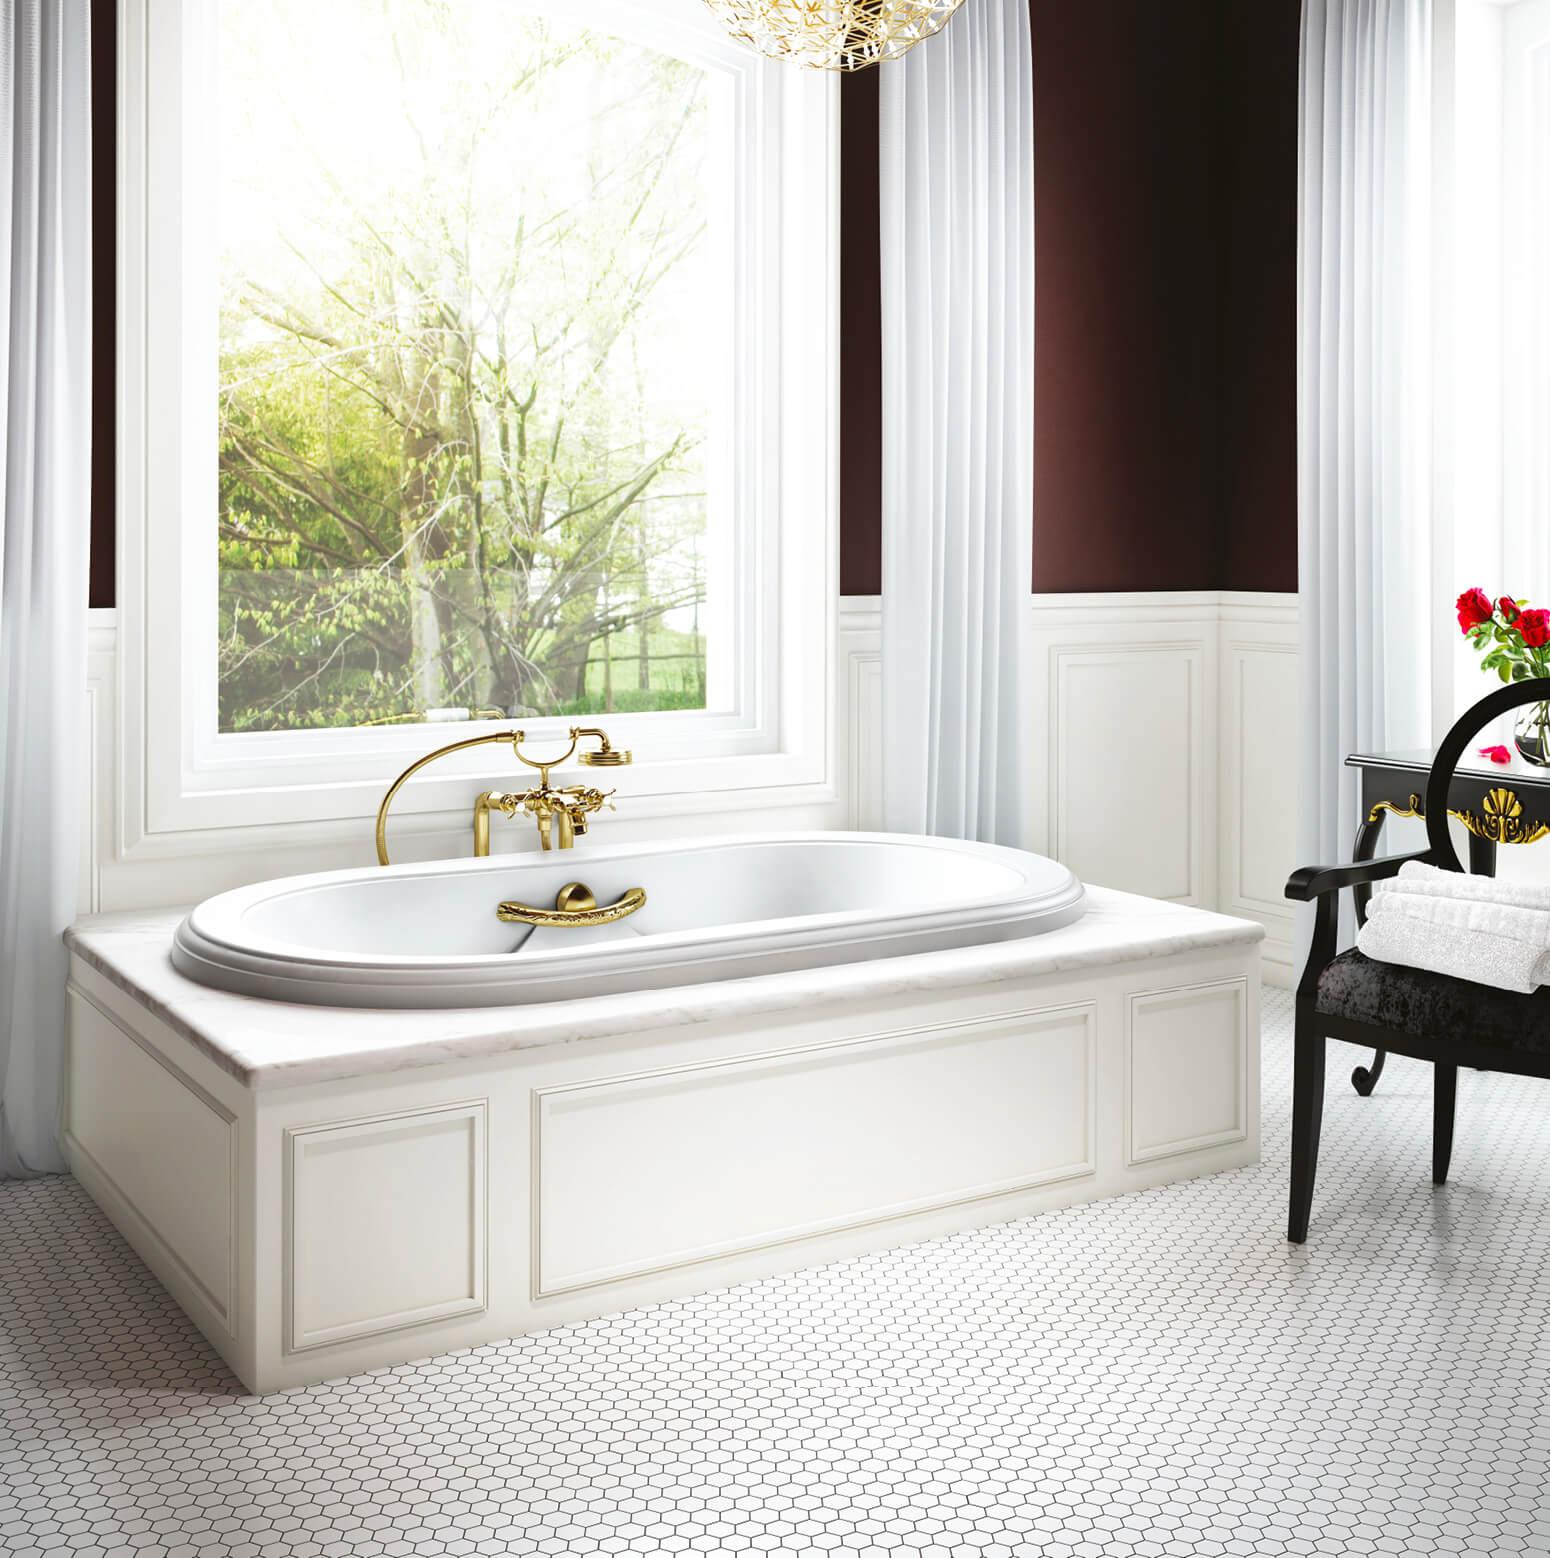 Bainultra Elegancia® collection freestanding alcove air jet bathtub for your modern bathroom